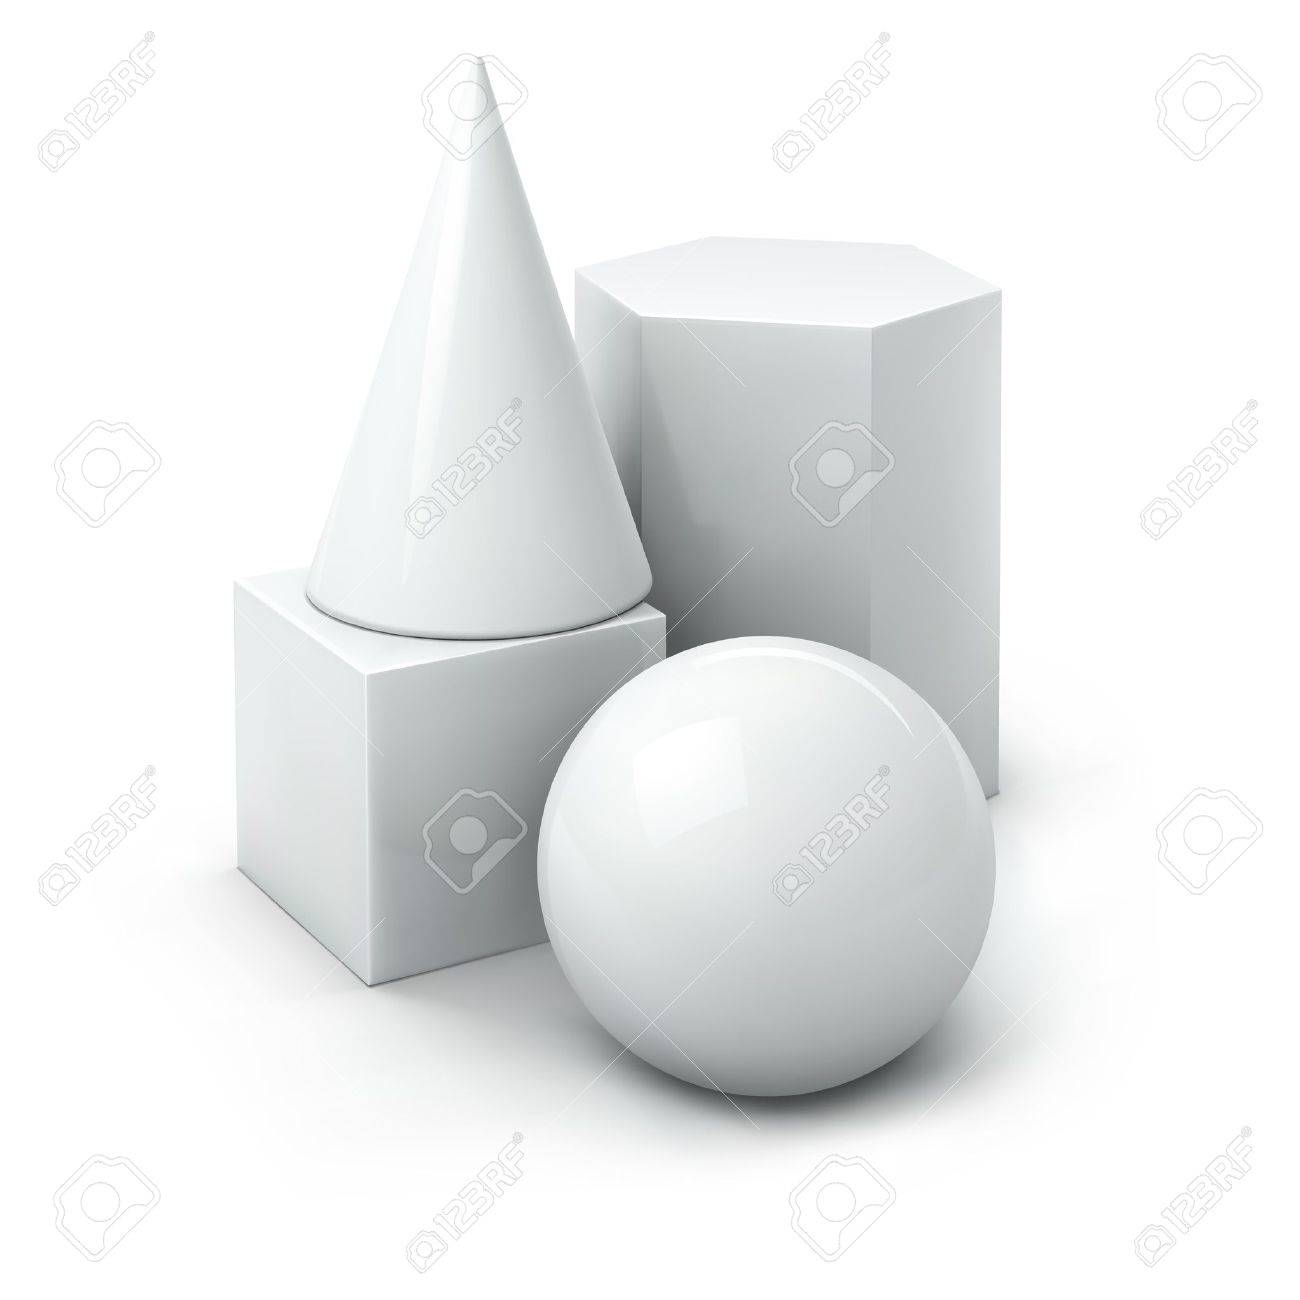 basic geometric 3d shapes Stock Vector - 9955639